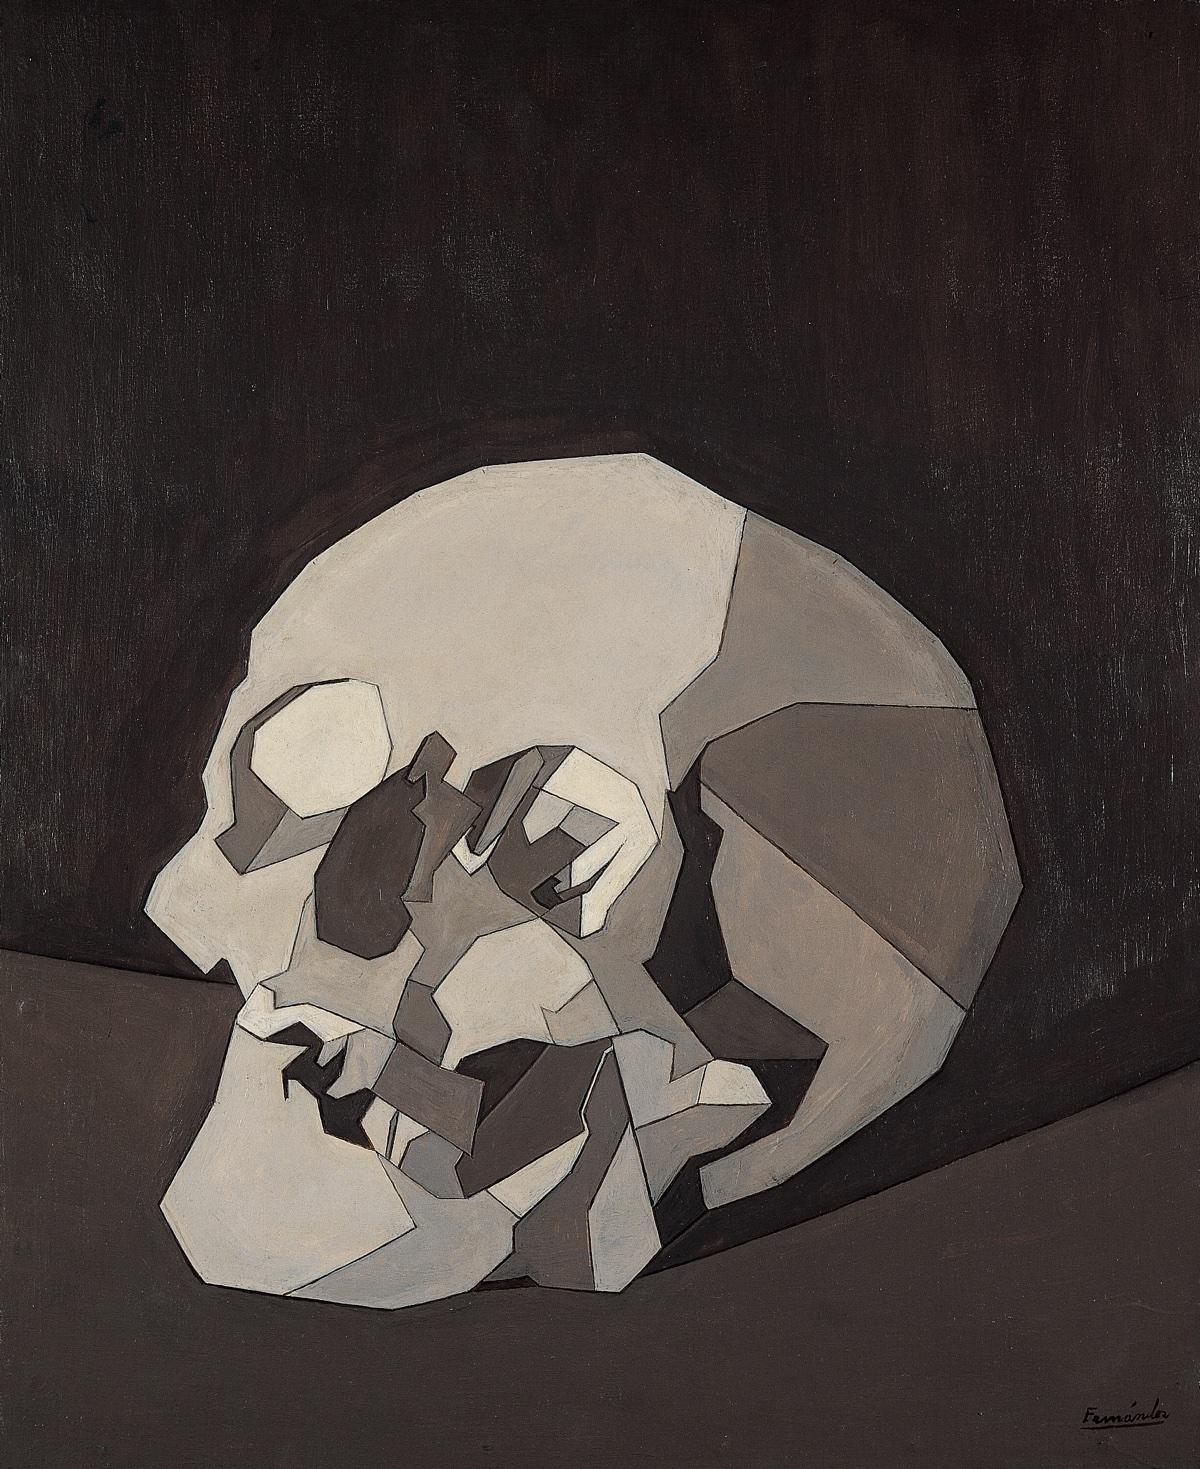 (Luis Fernández) Crâne (1958). Luis Fernández. Colección Telefónica.